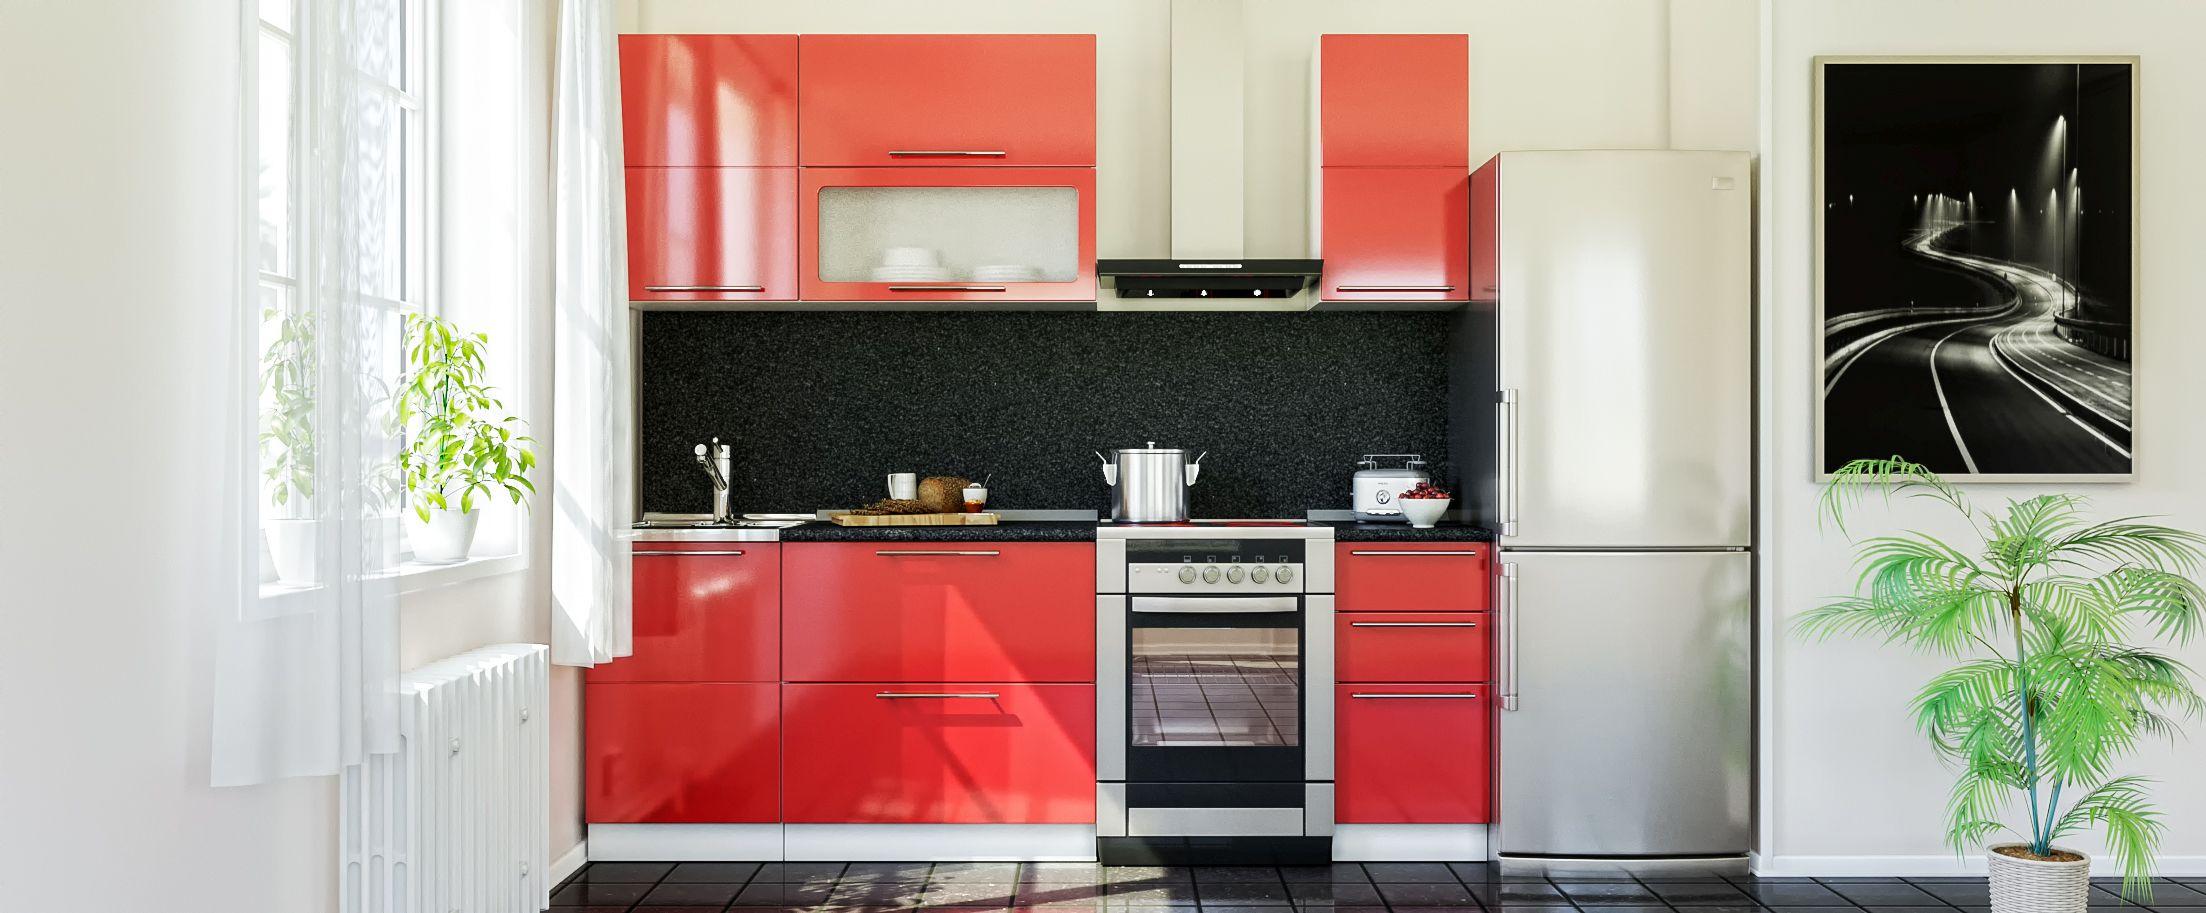 Кухня Красный глянец 1,7 м от MOON TRADE